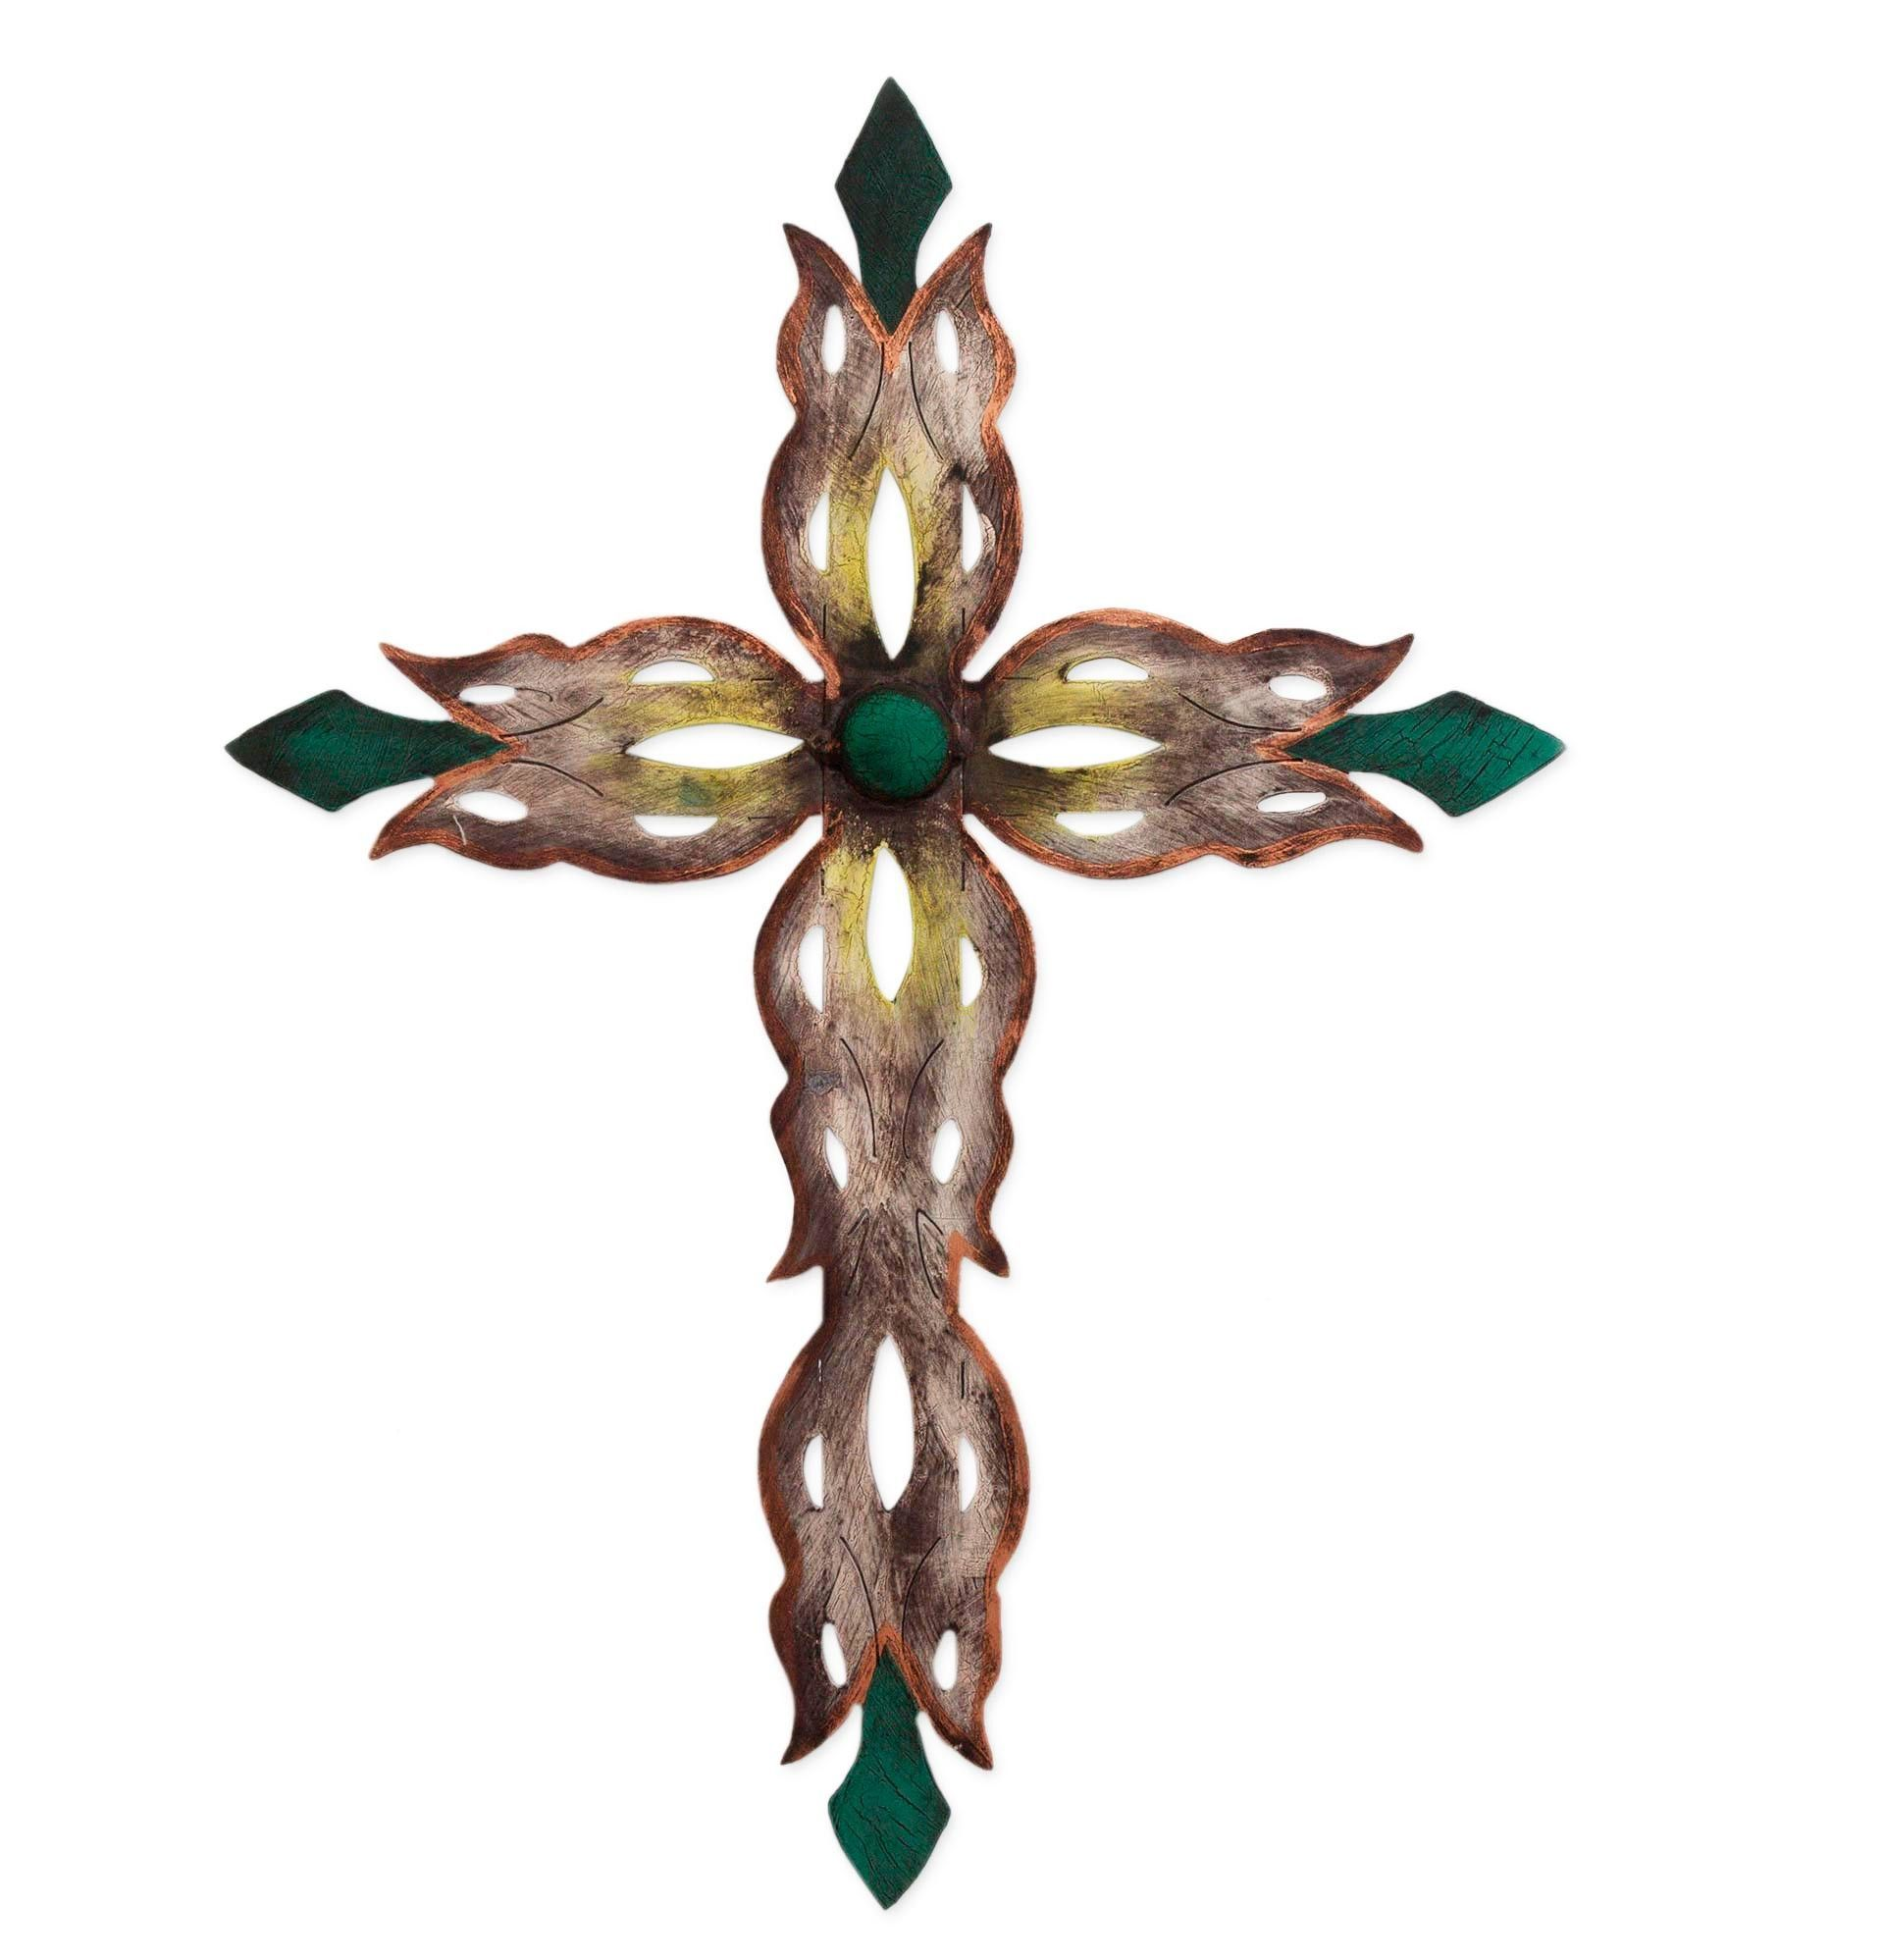 Alejandro de esesarte handcrafted religious steel christian cross